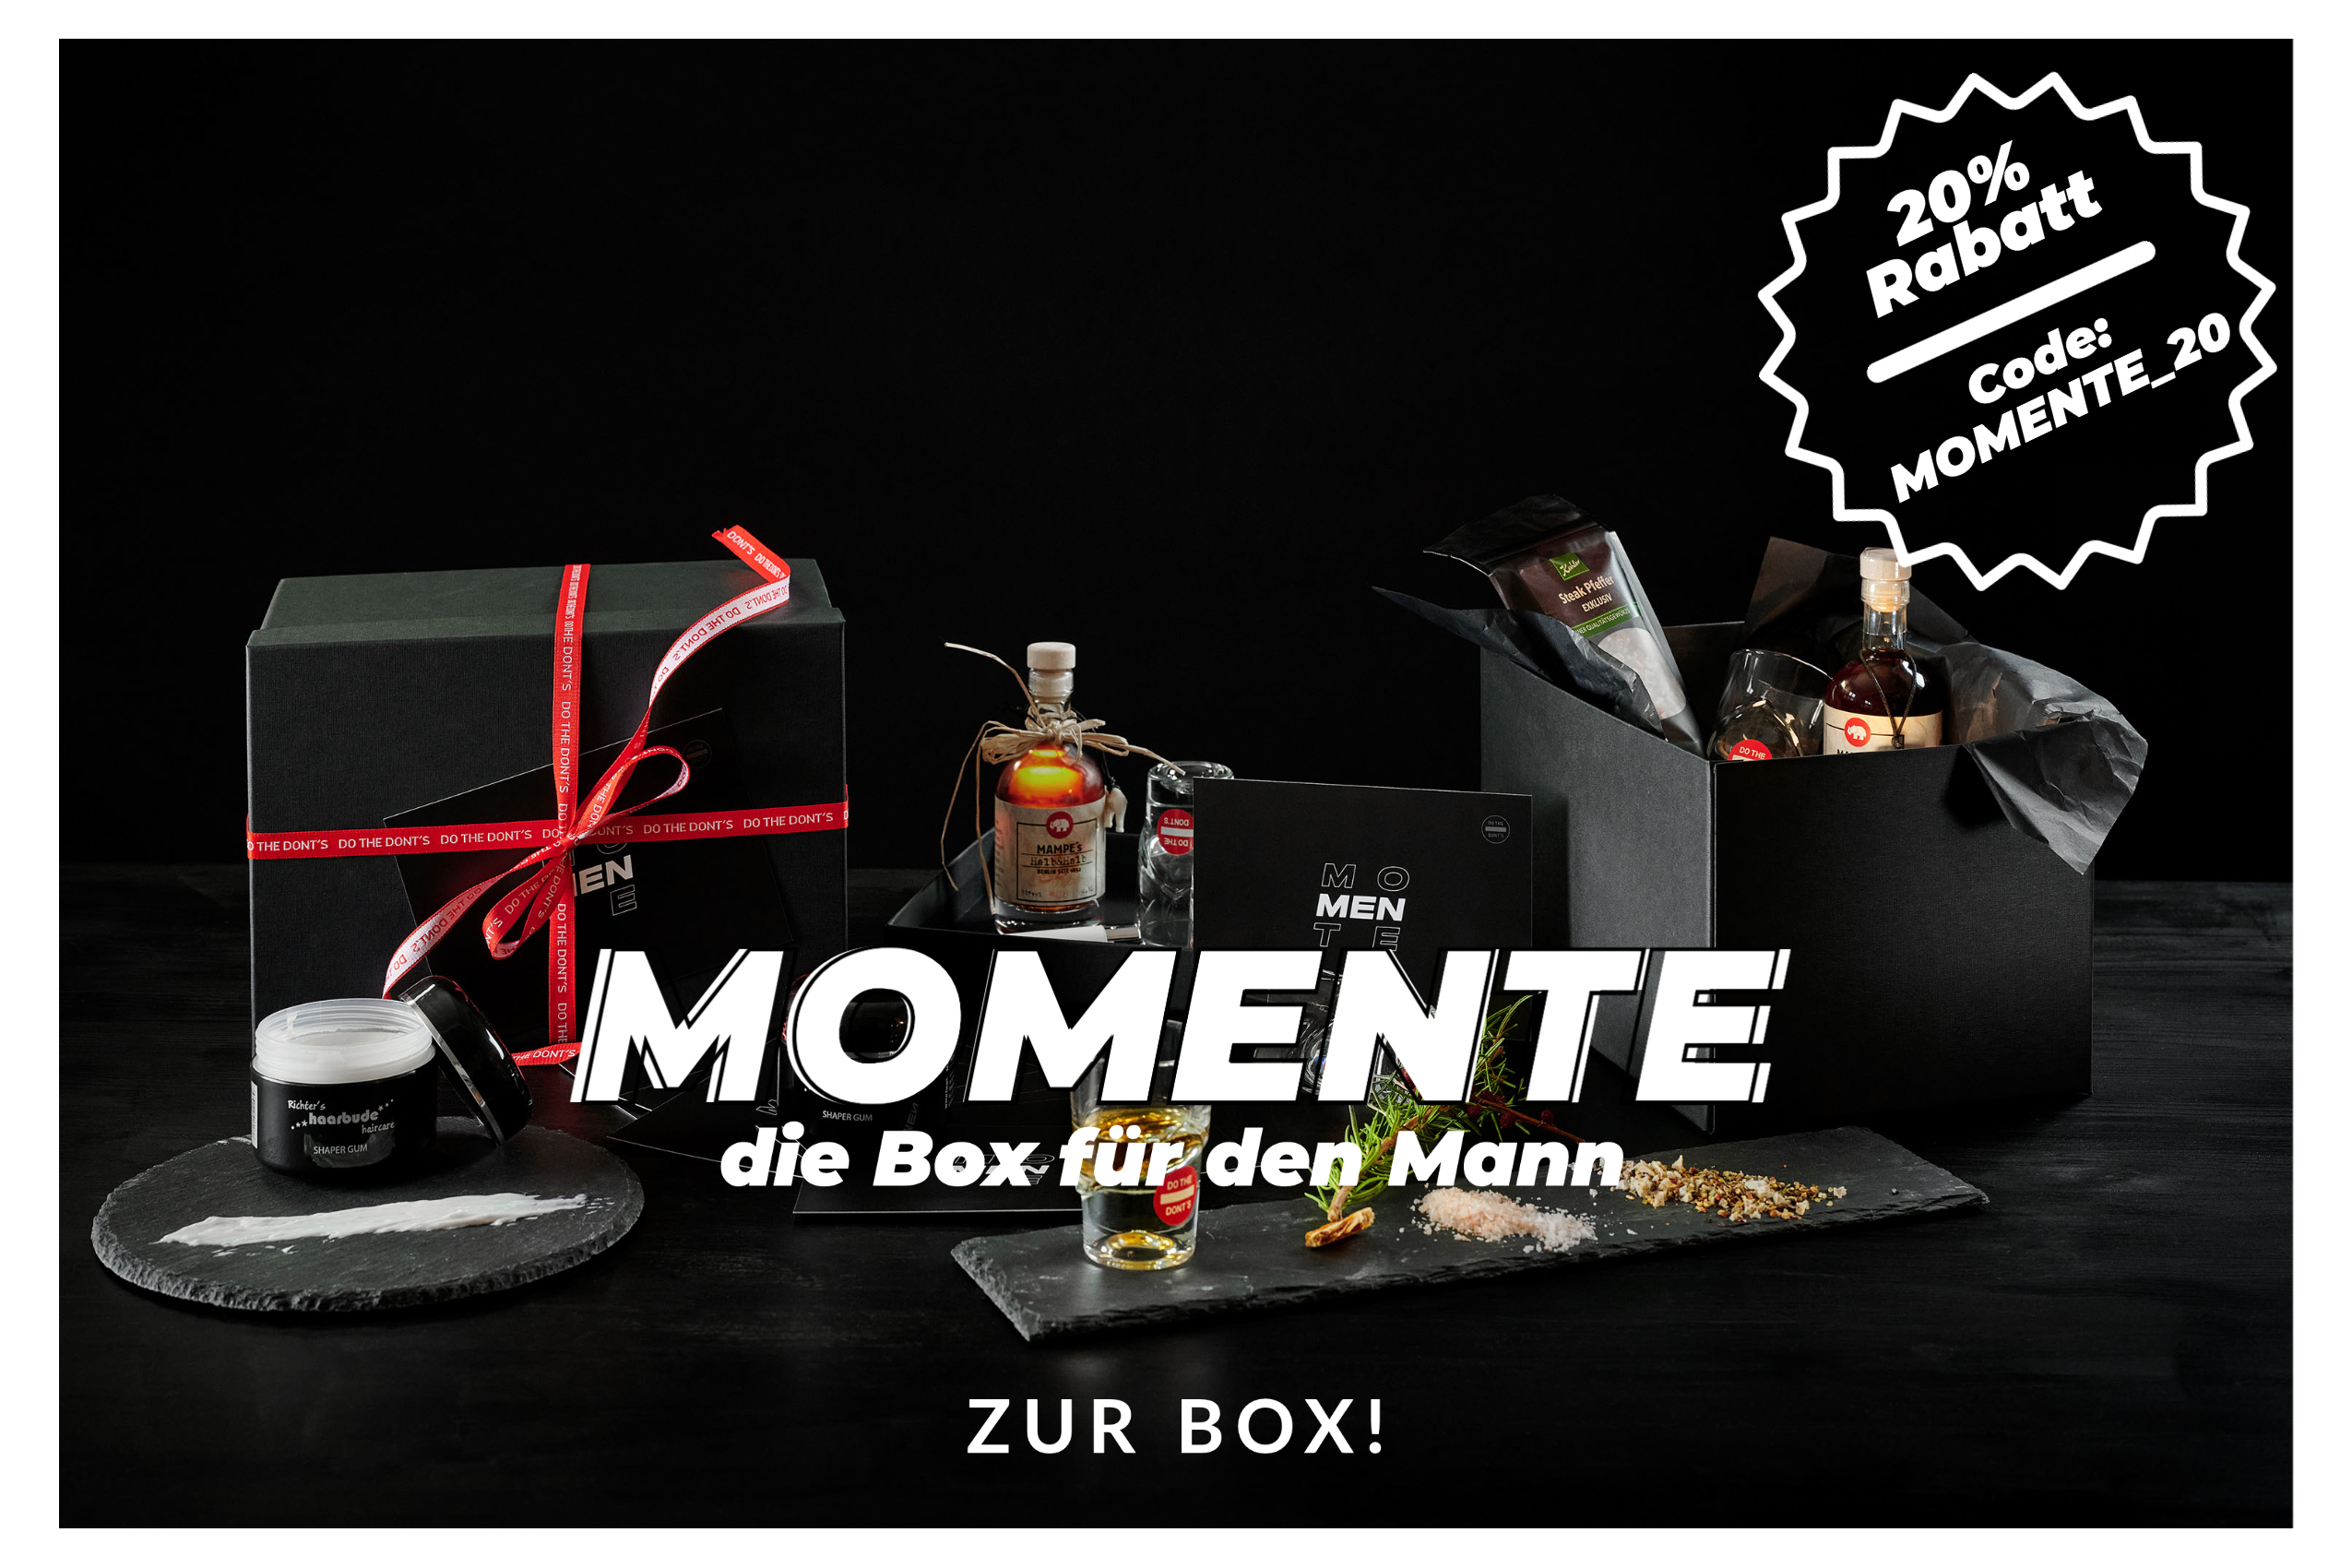 MOMENTE_Bild_mit_Rabattcode